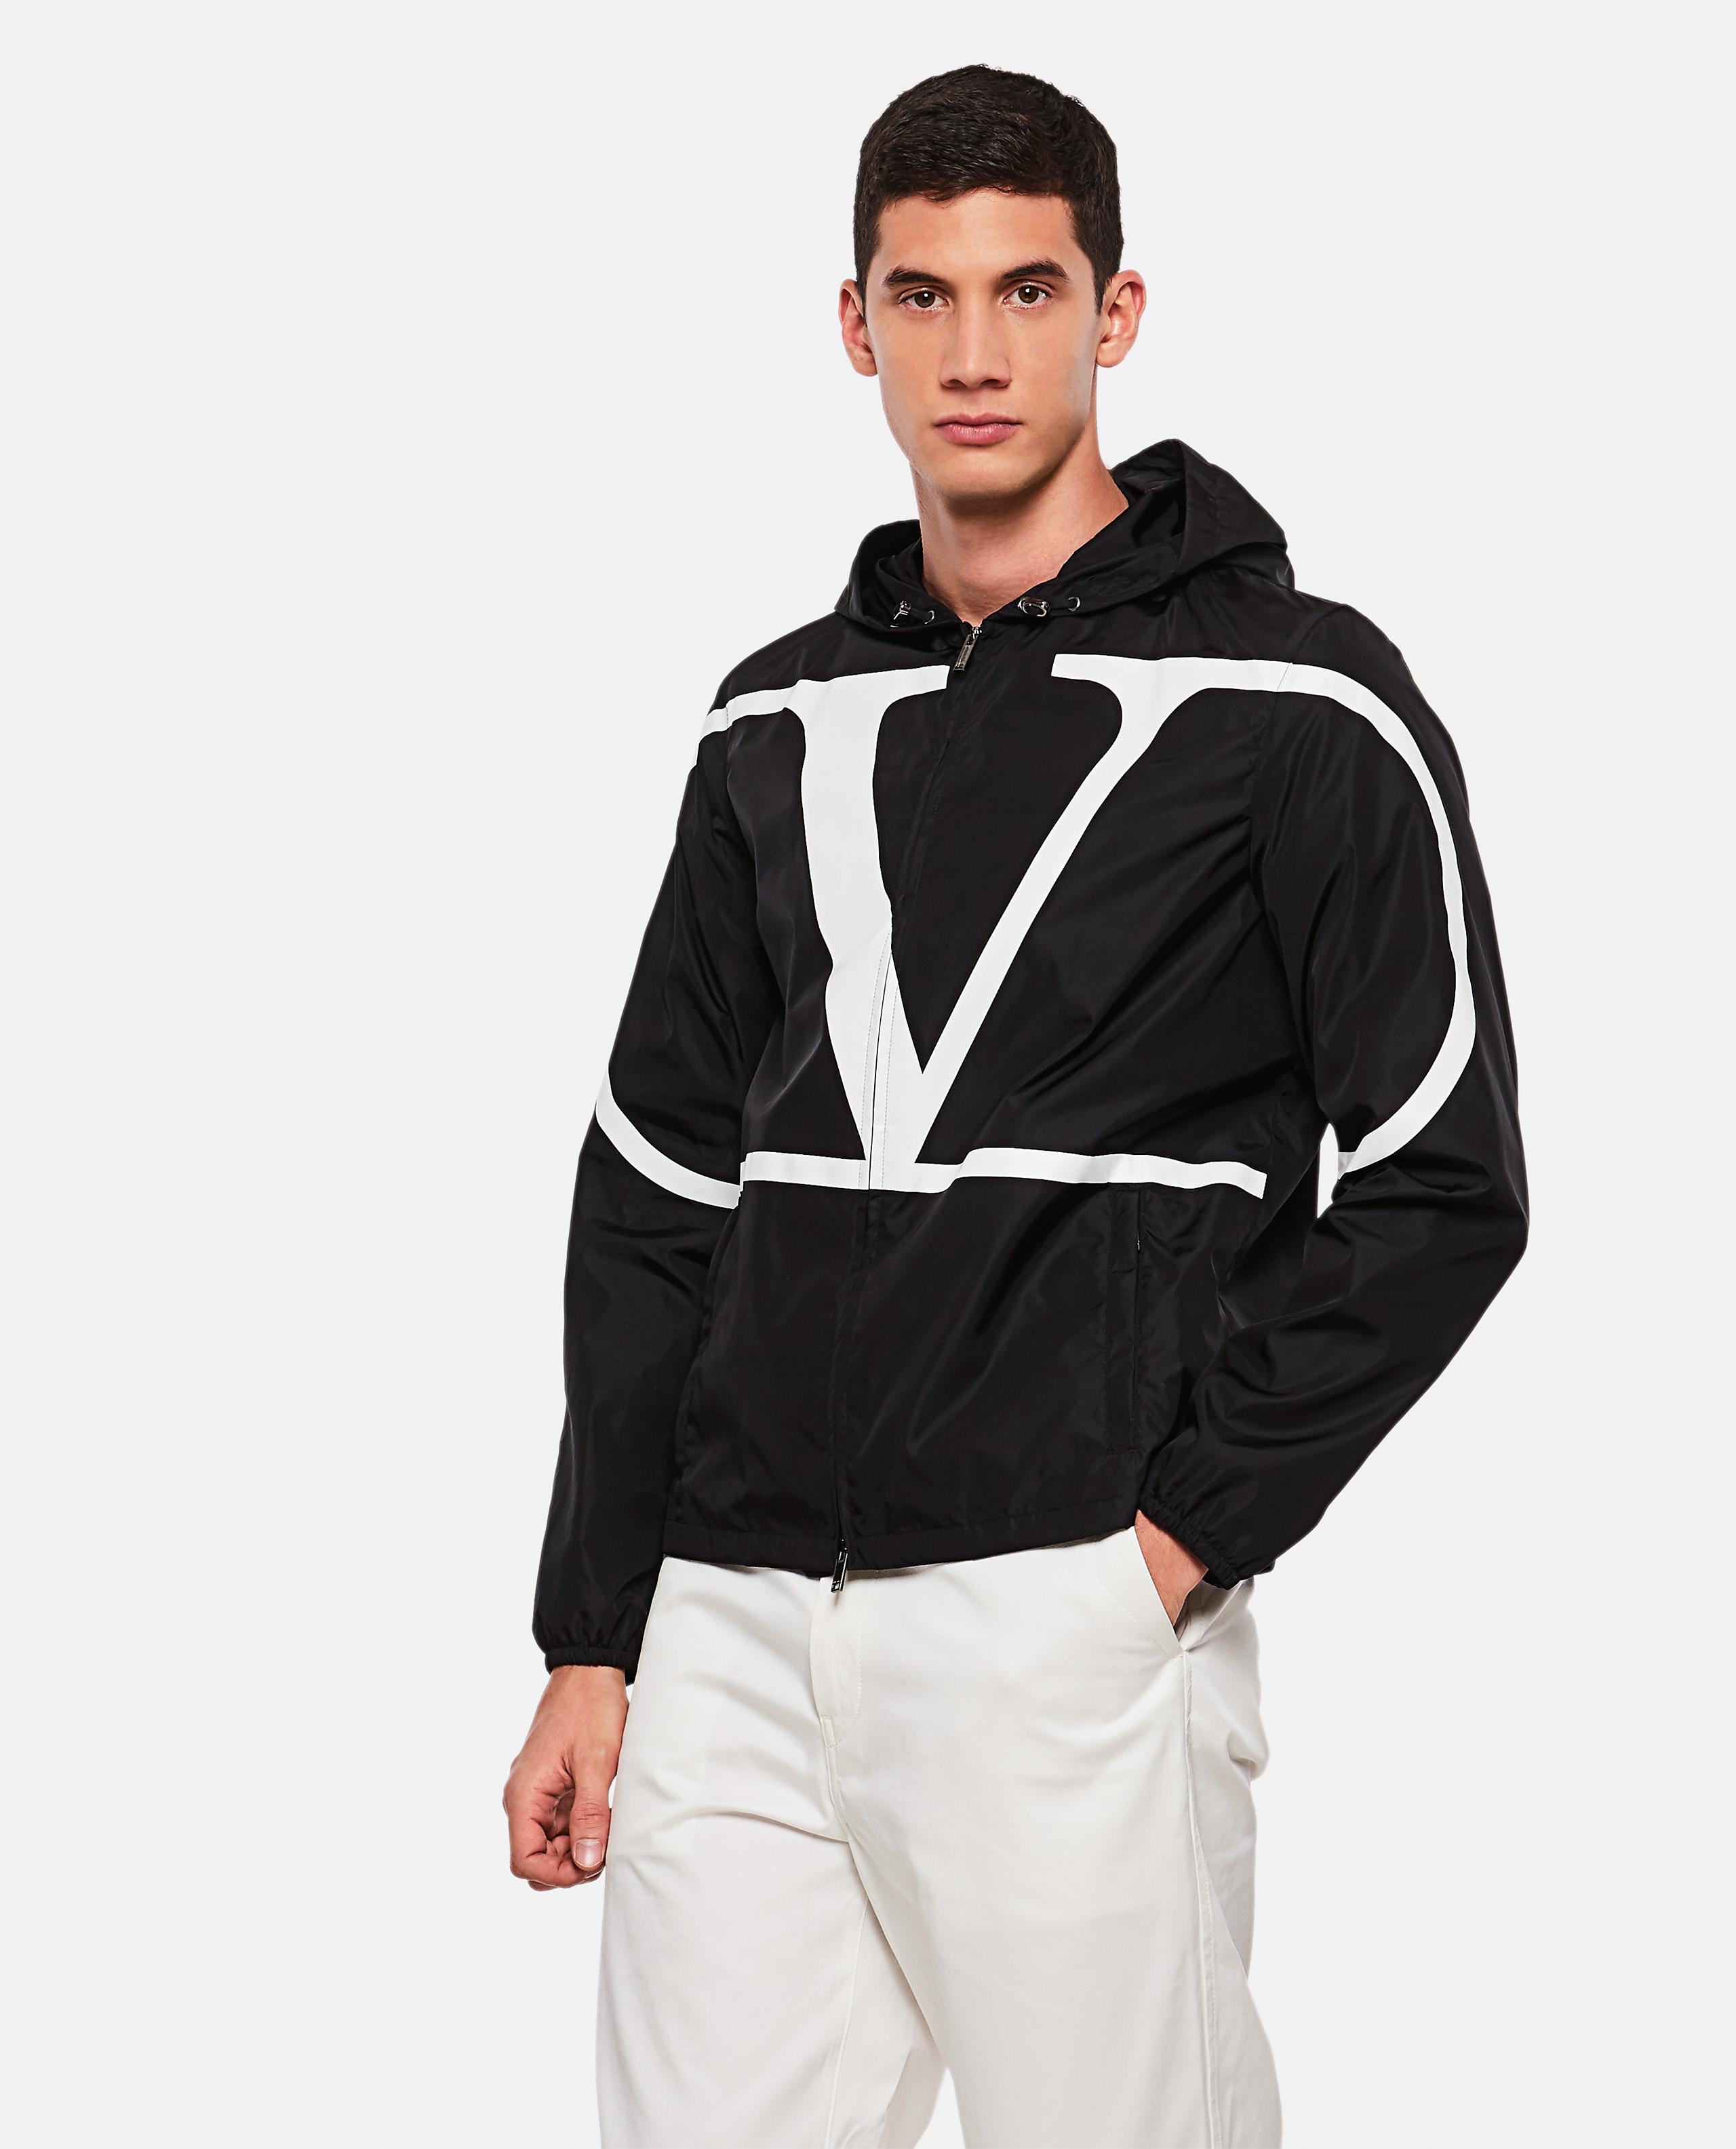 VLOGO jacket